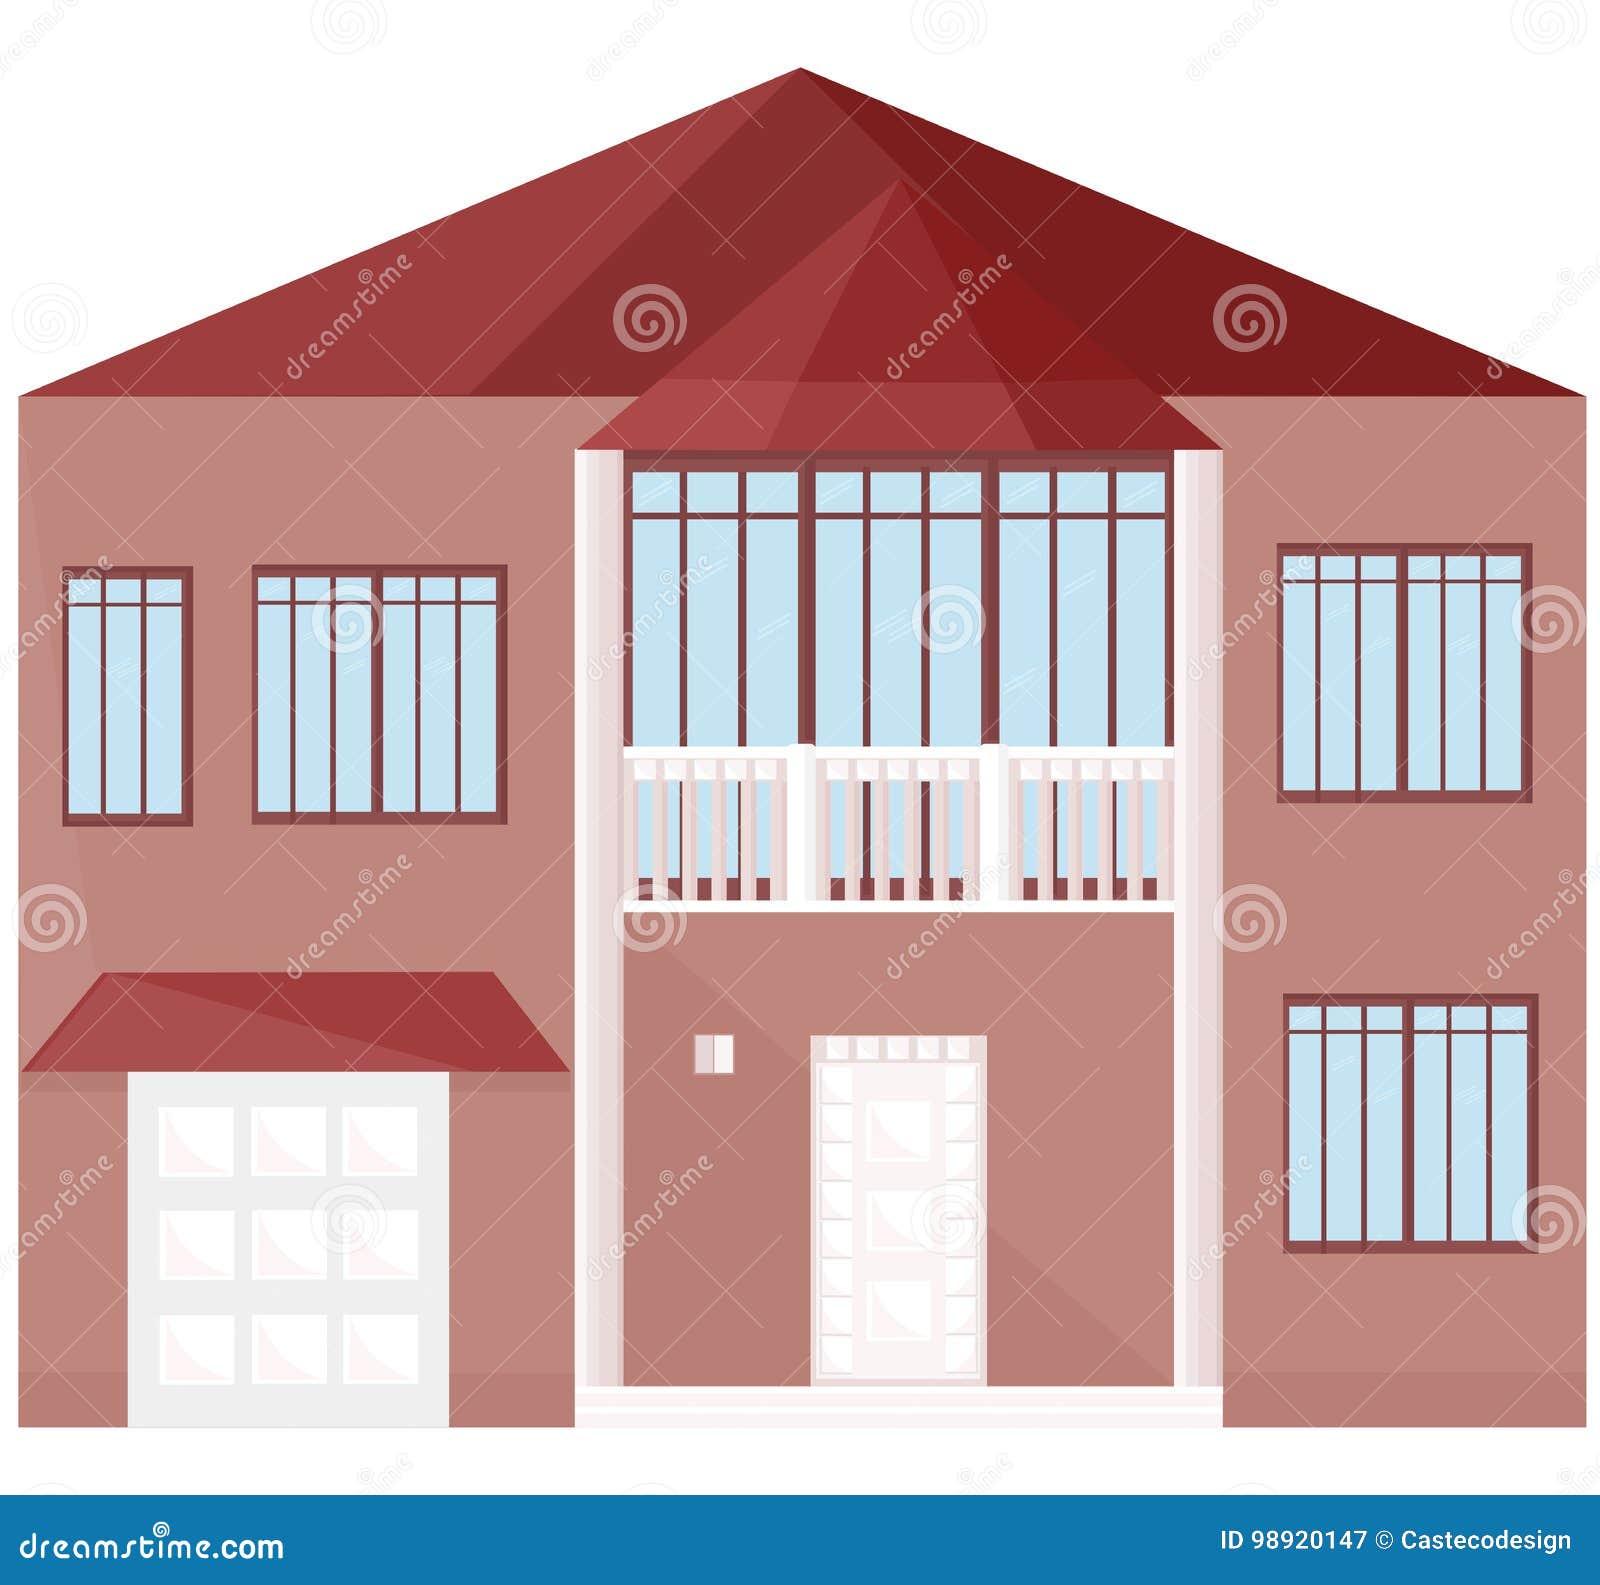 Modern Architecture Facade Building Vector Illustrations Stock ...